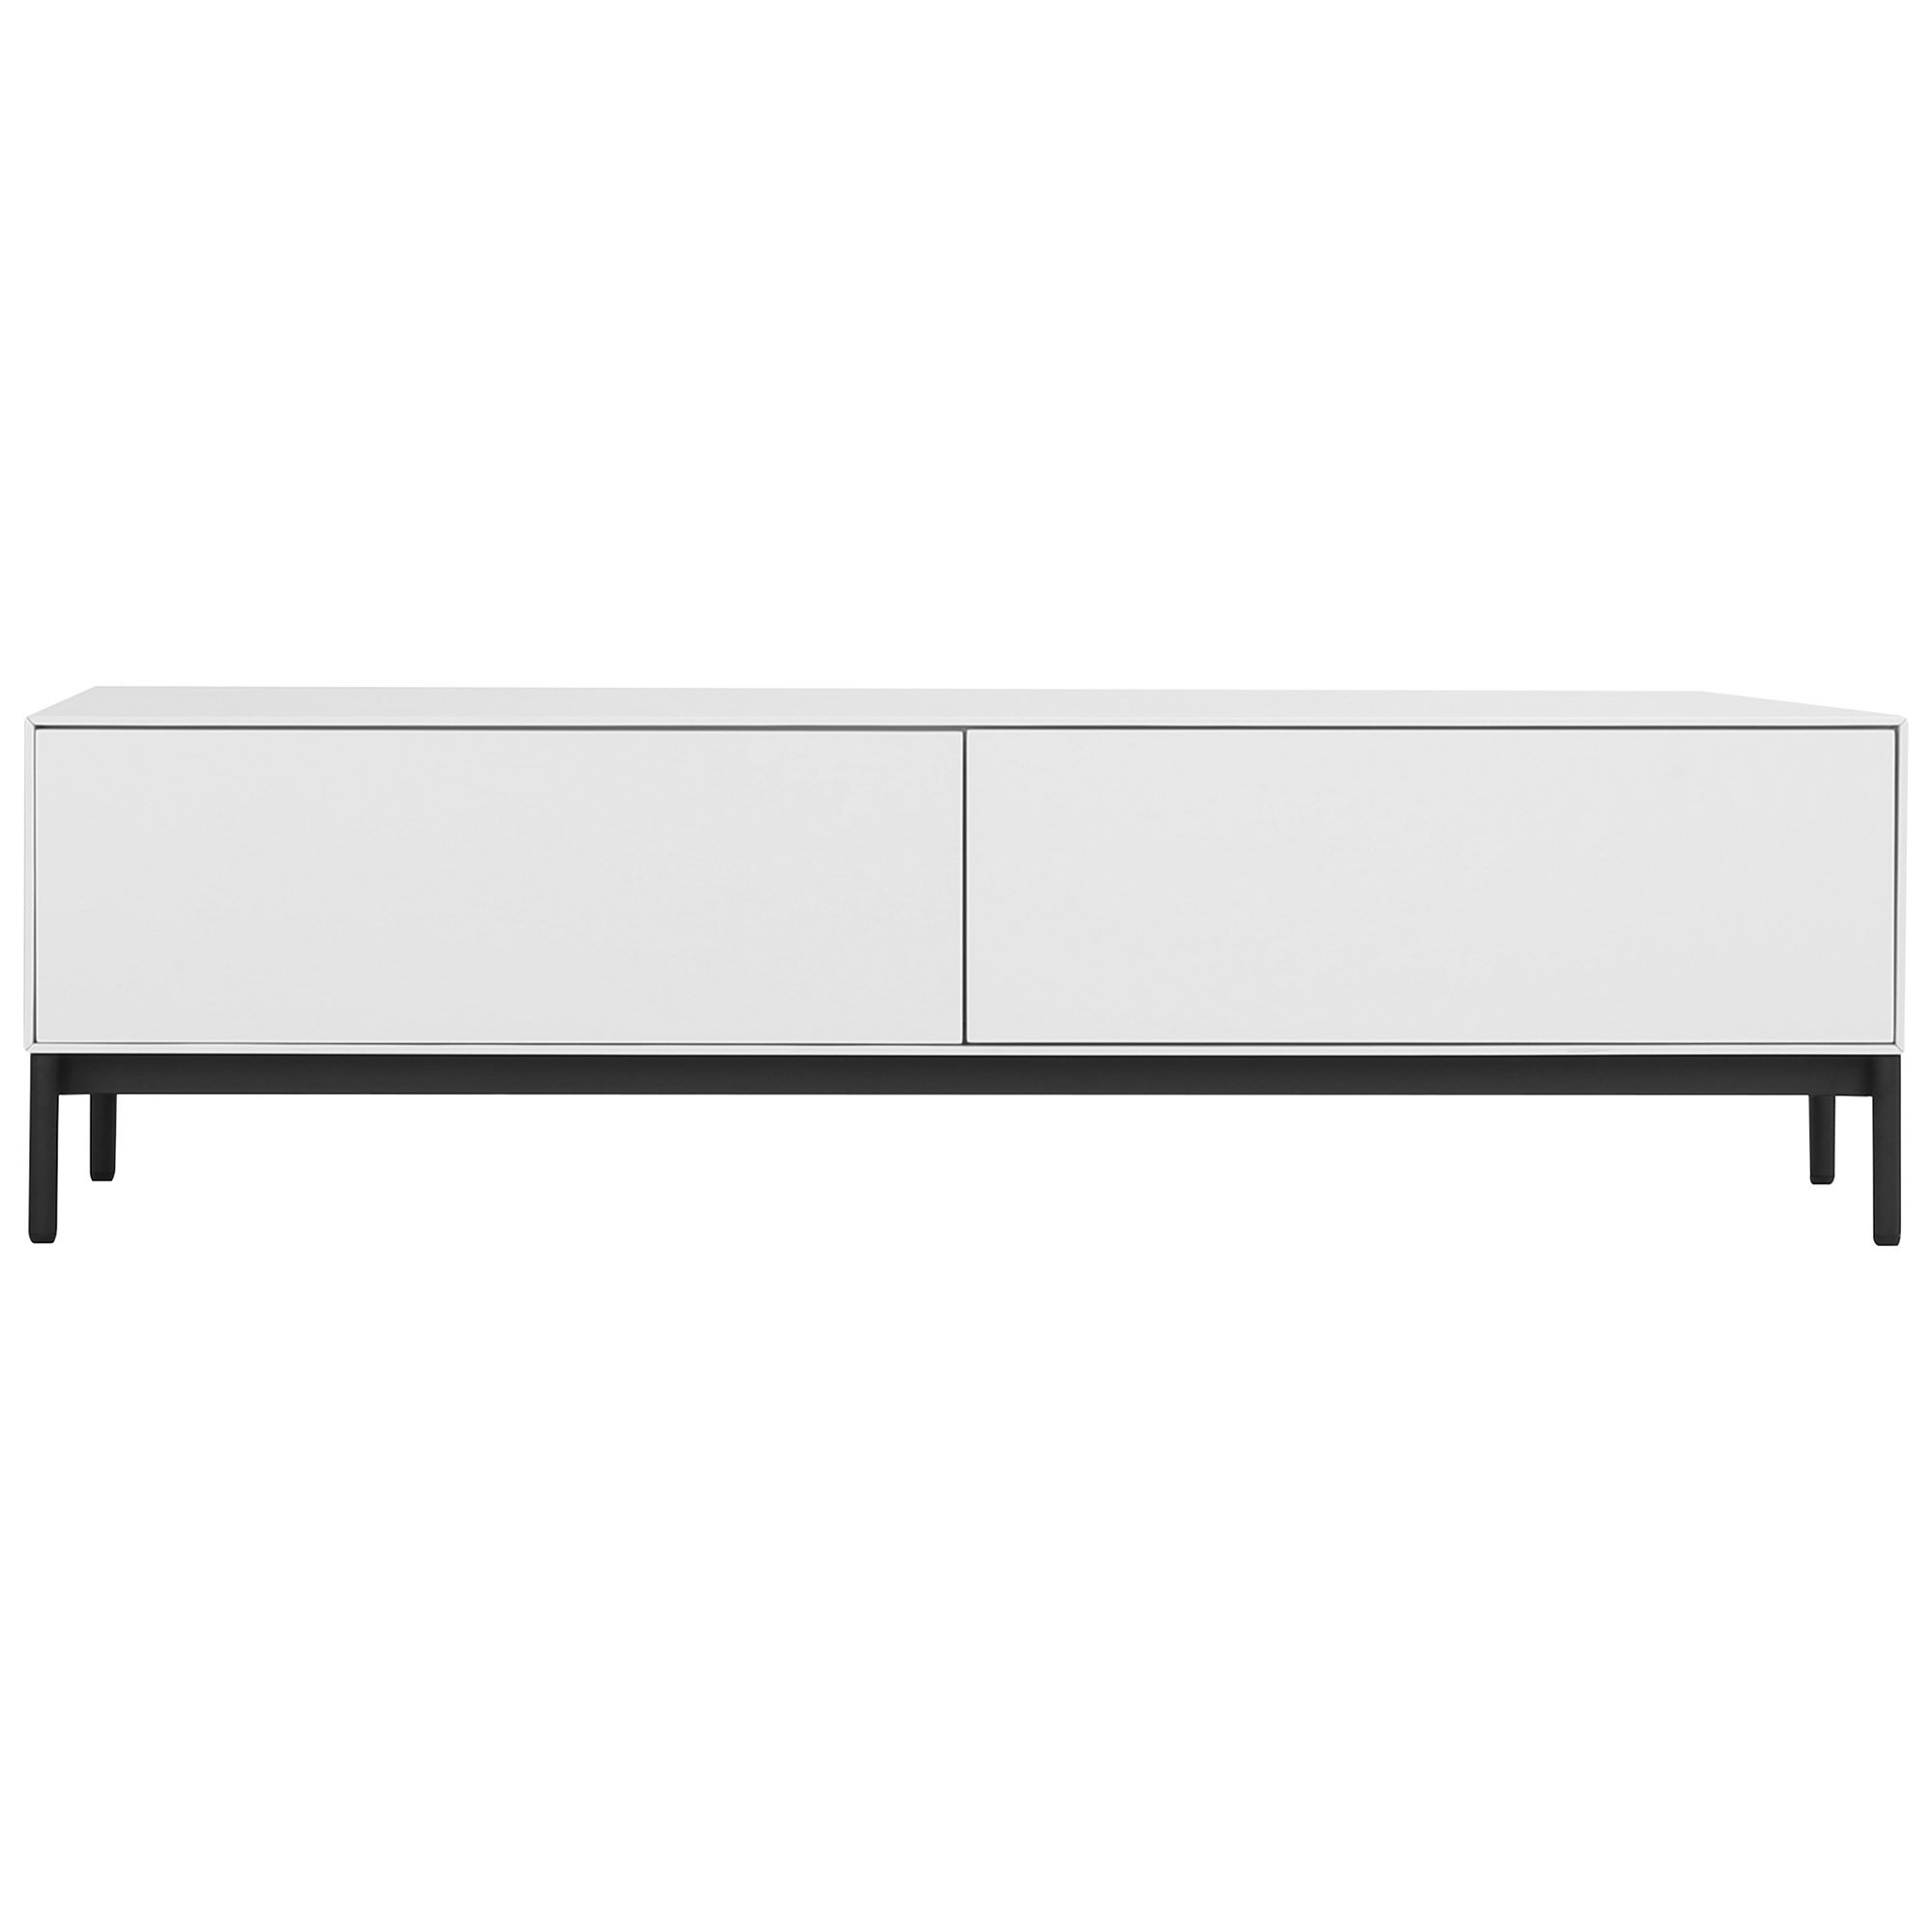 Lowell 2 Drawer TV Unit, 120cm, White